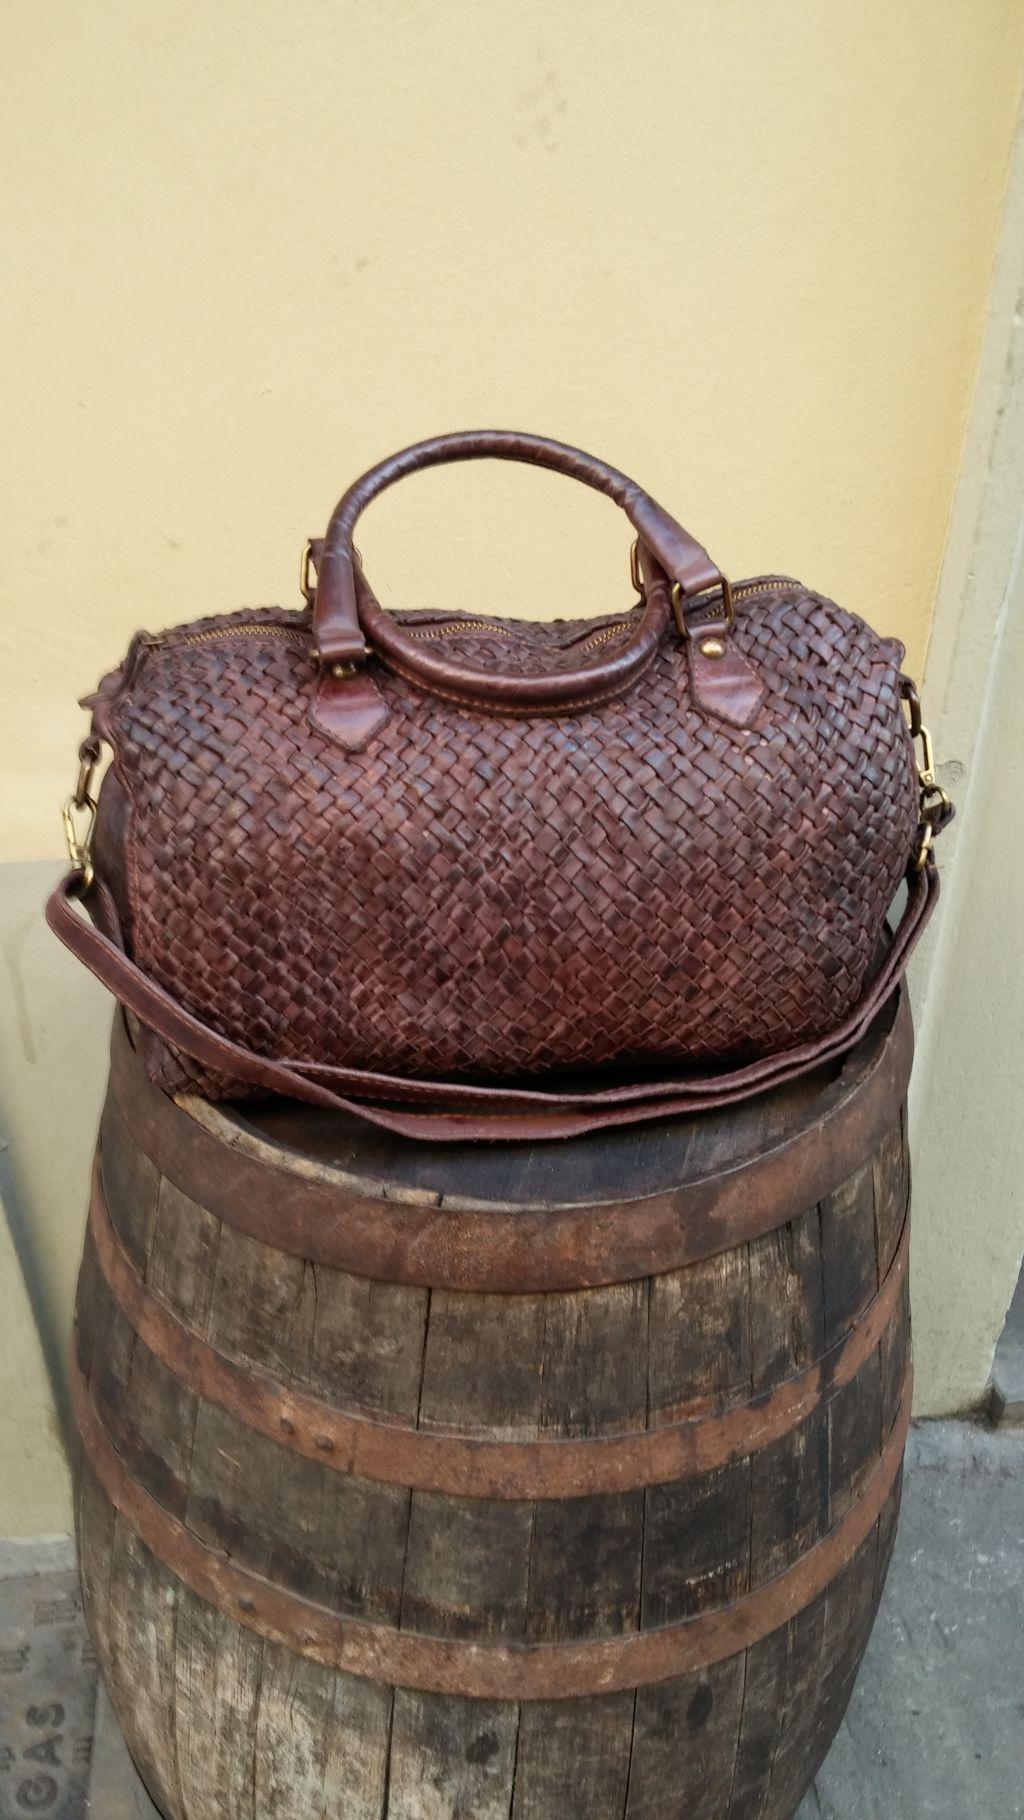 Prodotti in pelle Pagina 2 di 2 Florence Leather House